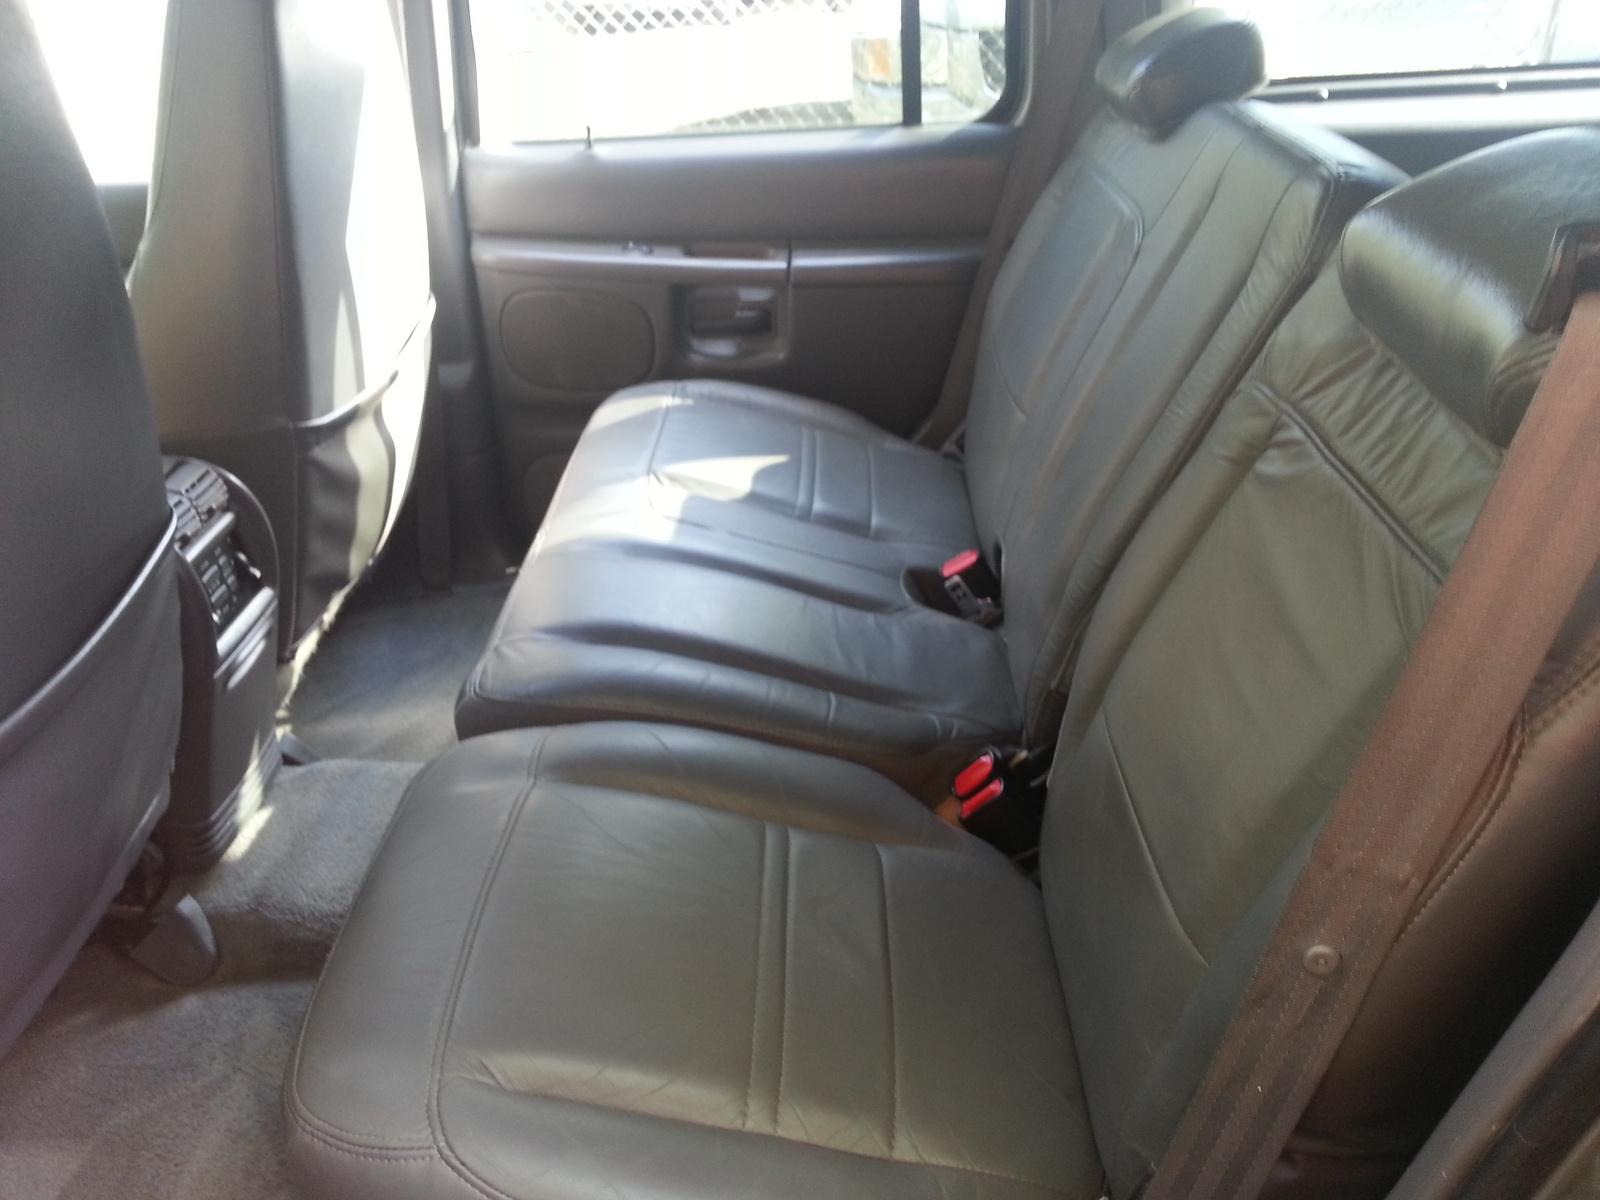 Picture Of 2000 Ford Explorer Eddie Bauer Interior: 2000 ford explorer interior parts